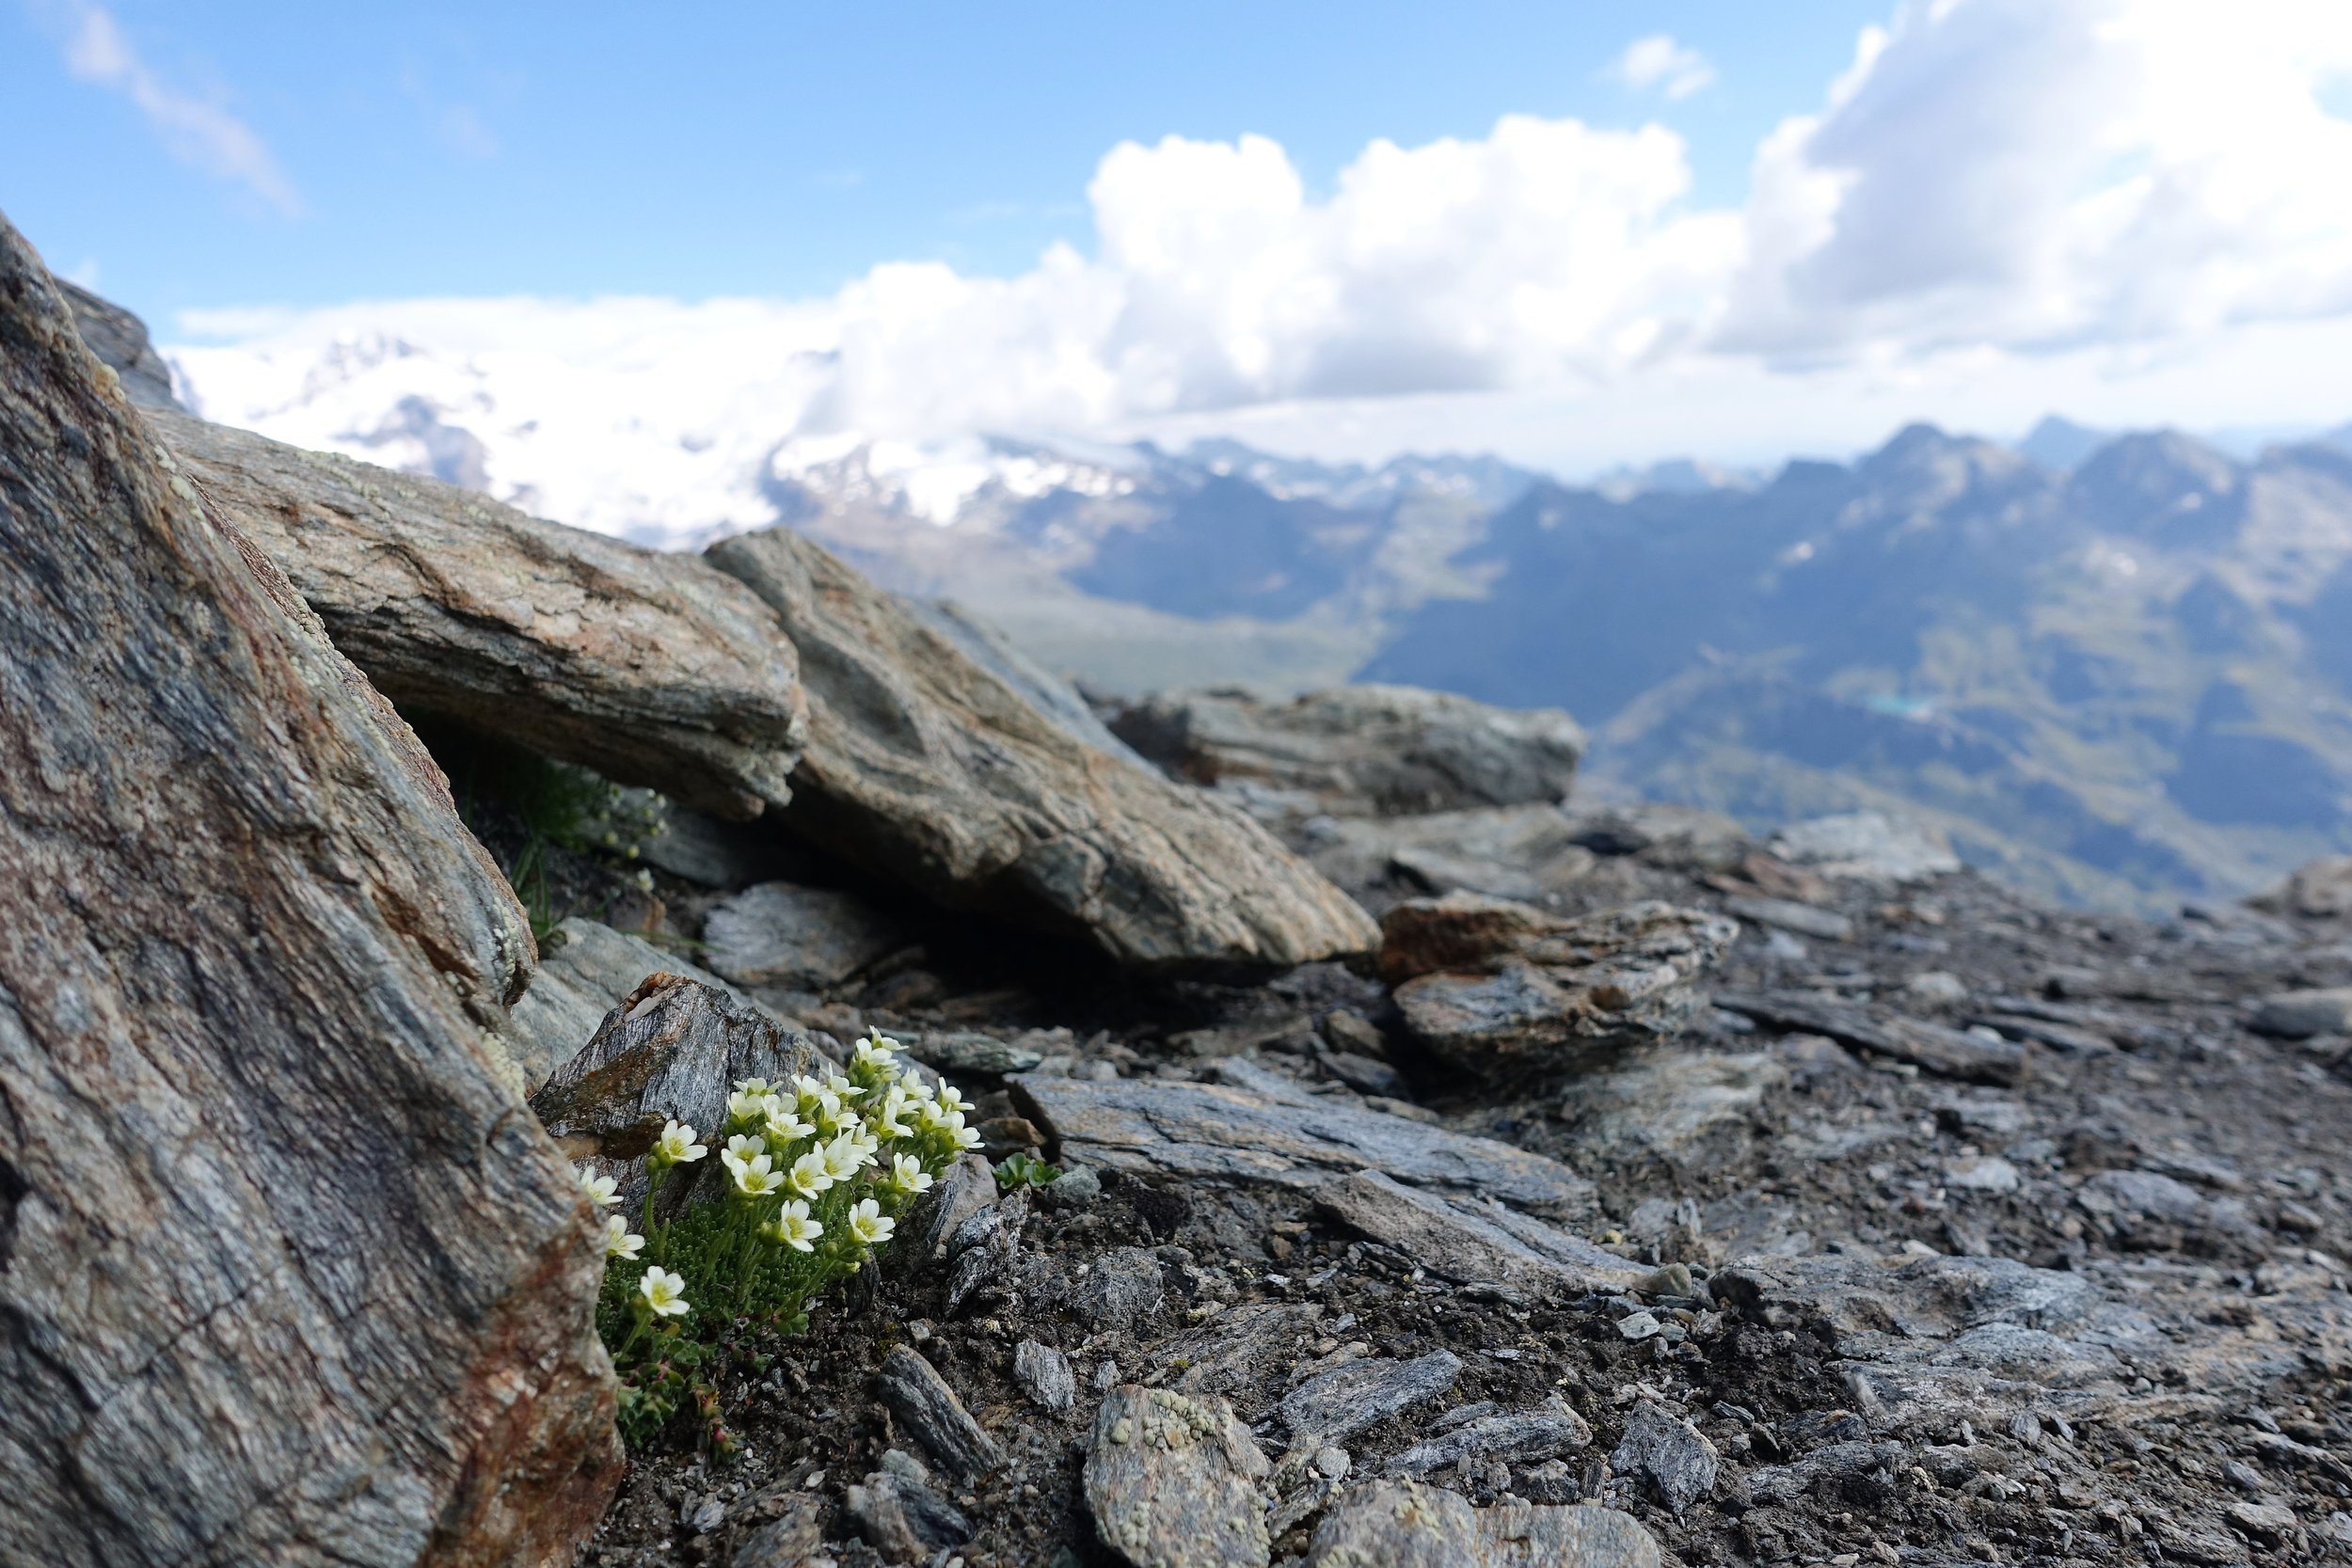 Testa Grigia summit, Valle d'Aosta, Italy (elev. 3300m).